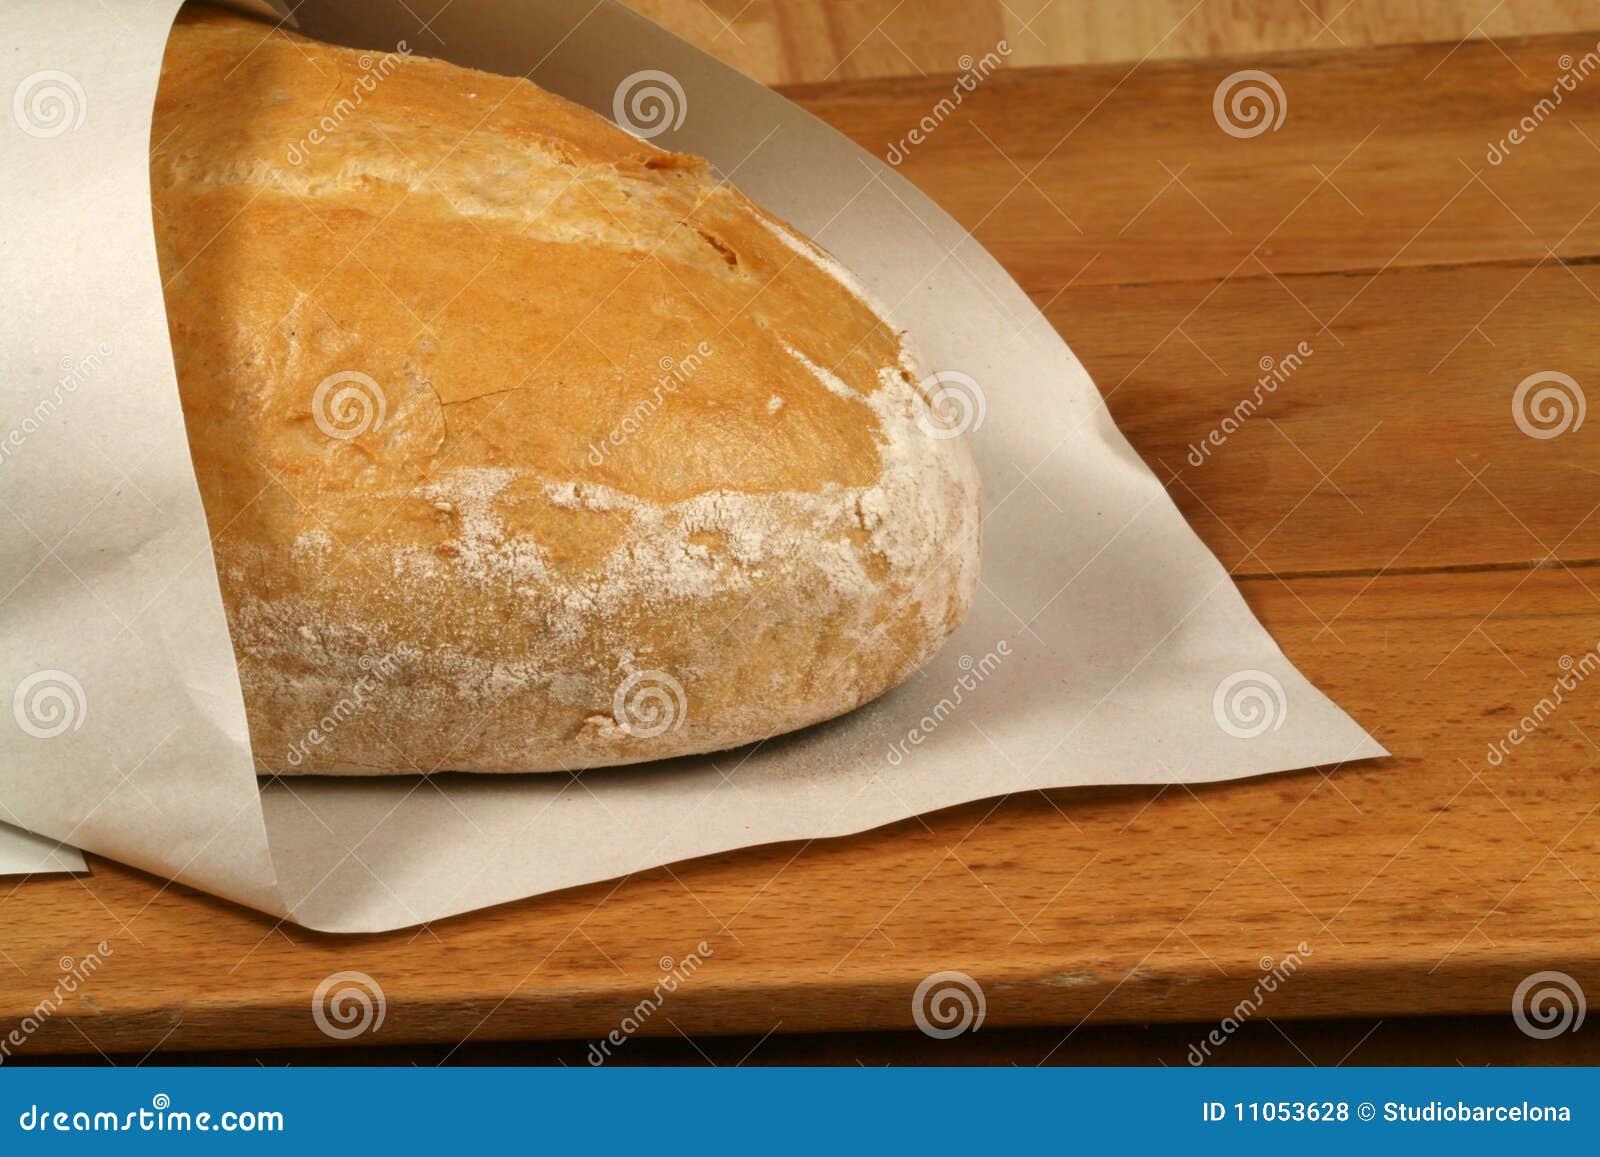 how to keep cob loaf warm